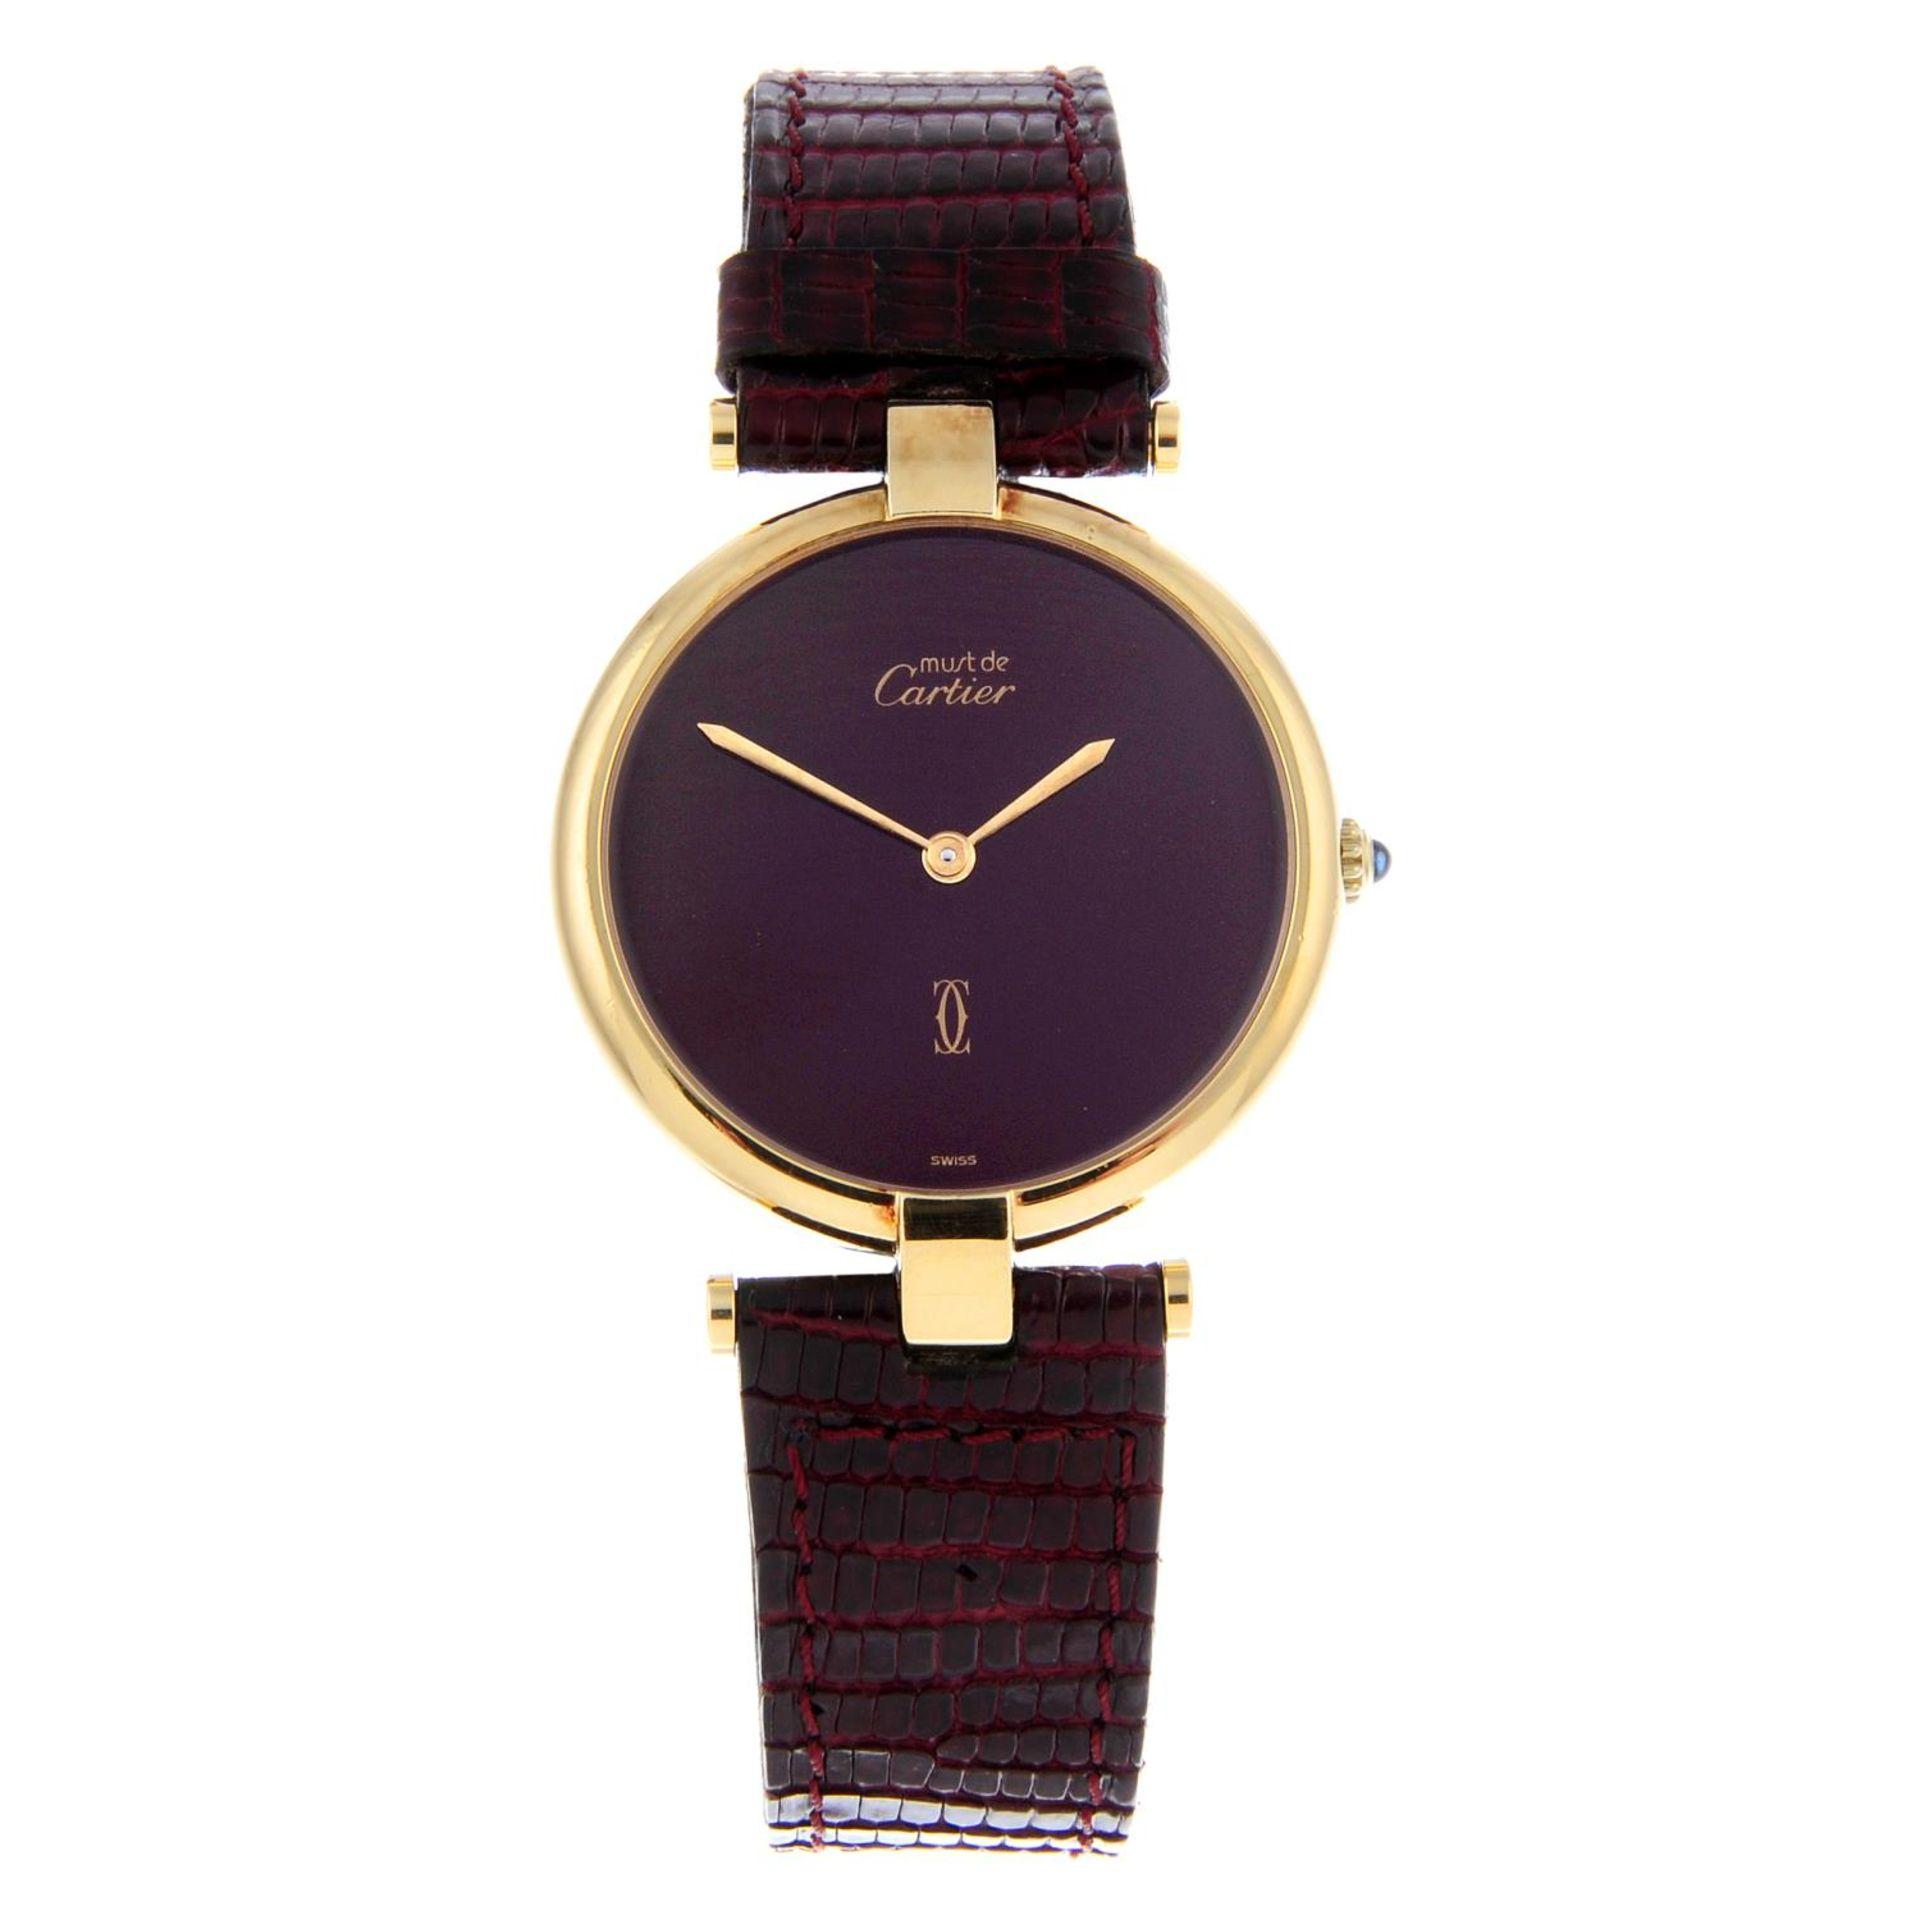 Los 18 - CARTIER - a Must De Cartier Vendome wrist watch.